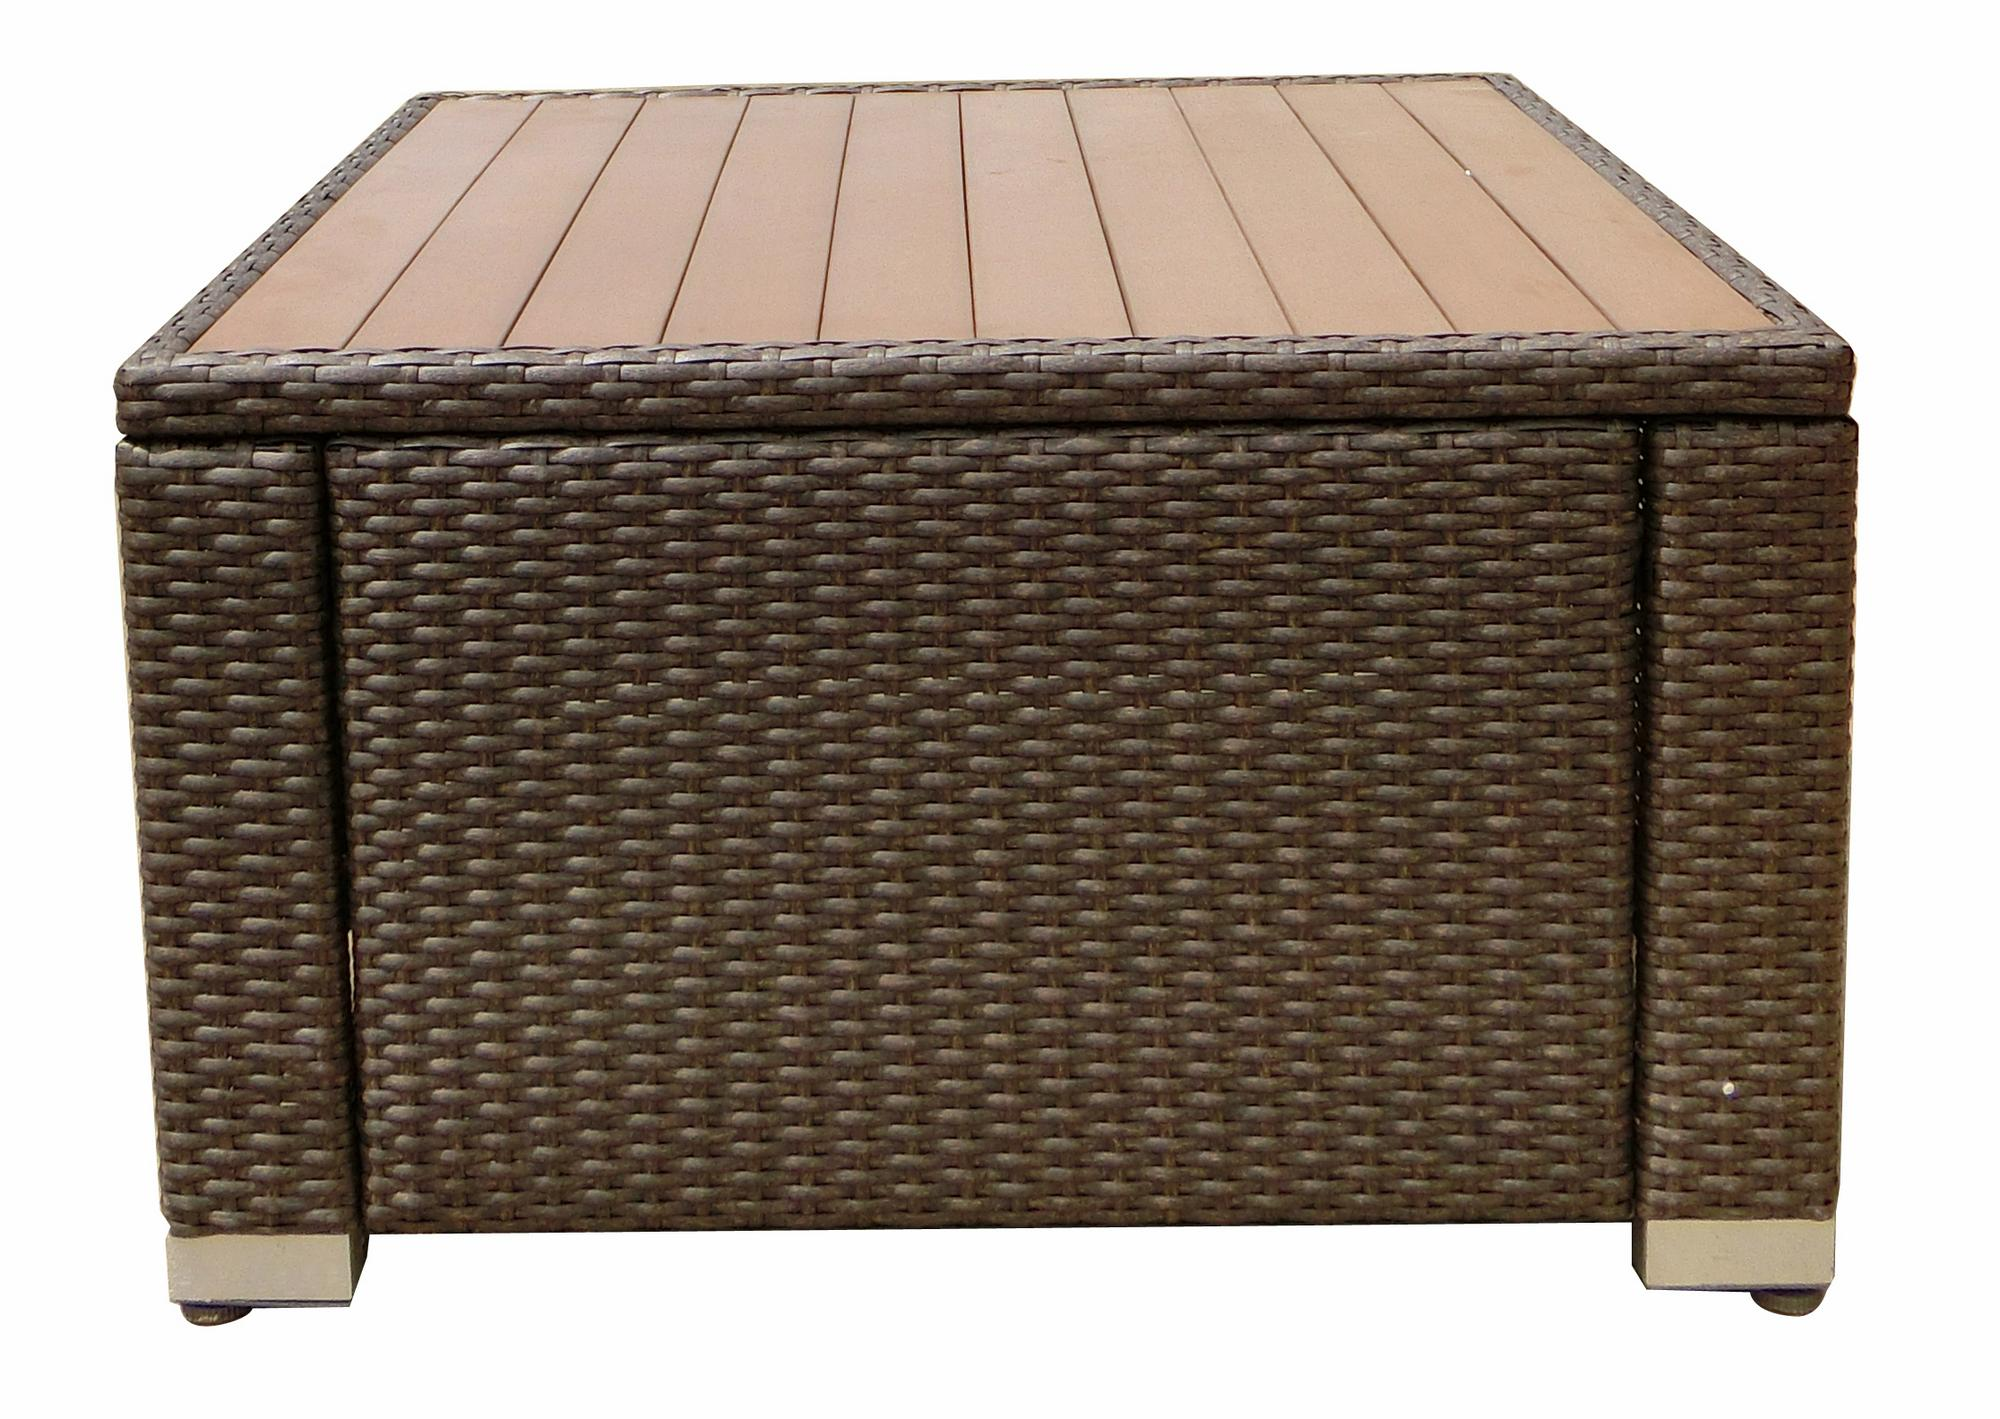 JJ Designs SB-3775-13 South Beach Wicker Patio Square Coffee Table